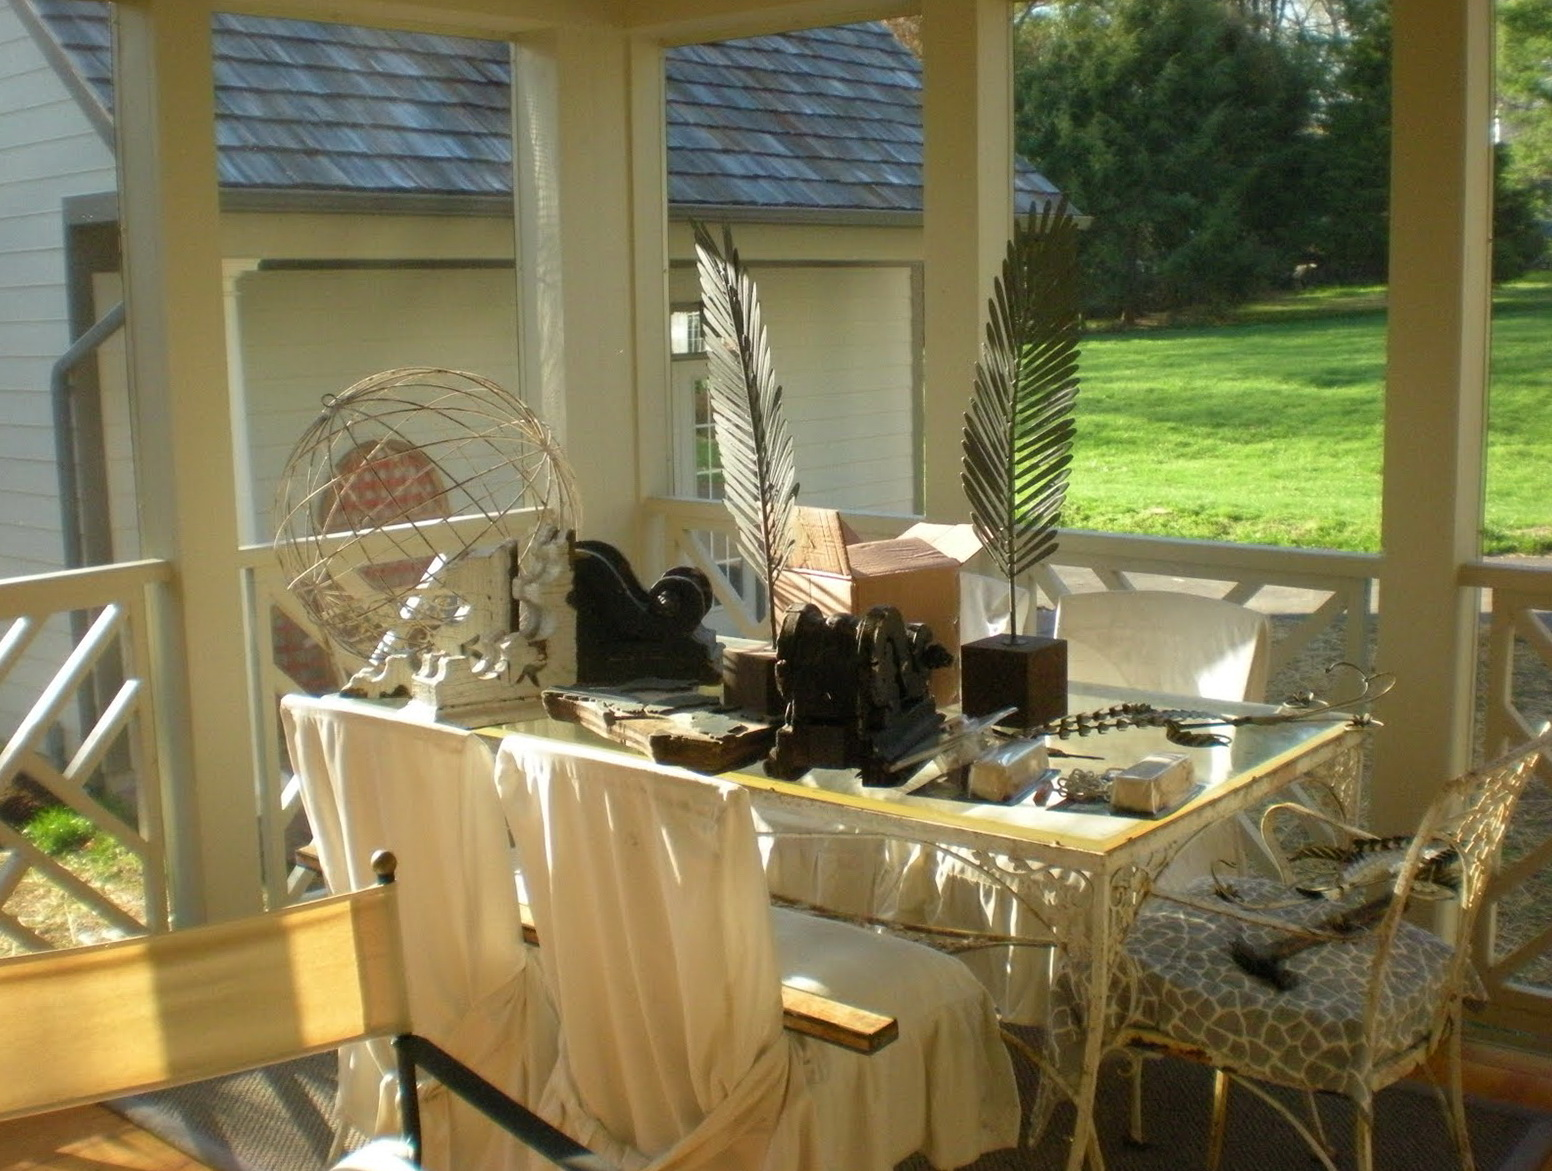 Small Screen Porch Decorating Ideas | Home Design Ideas